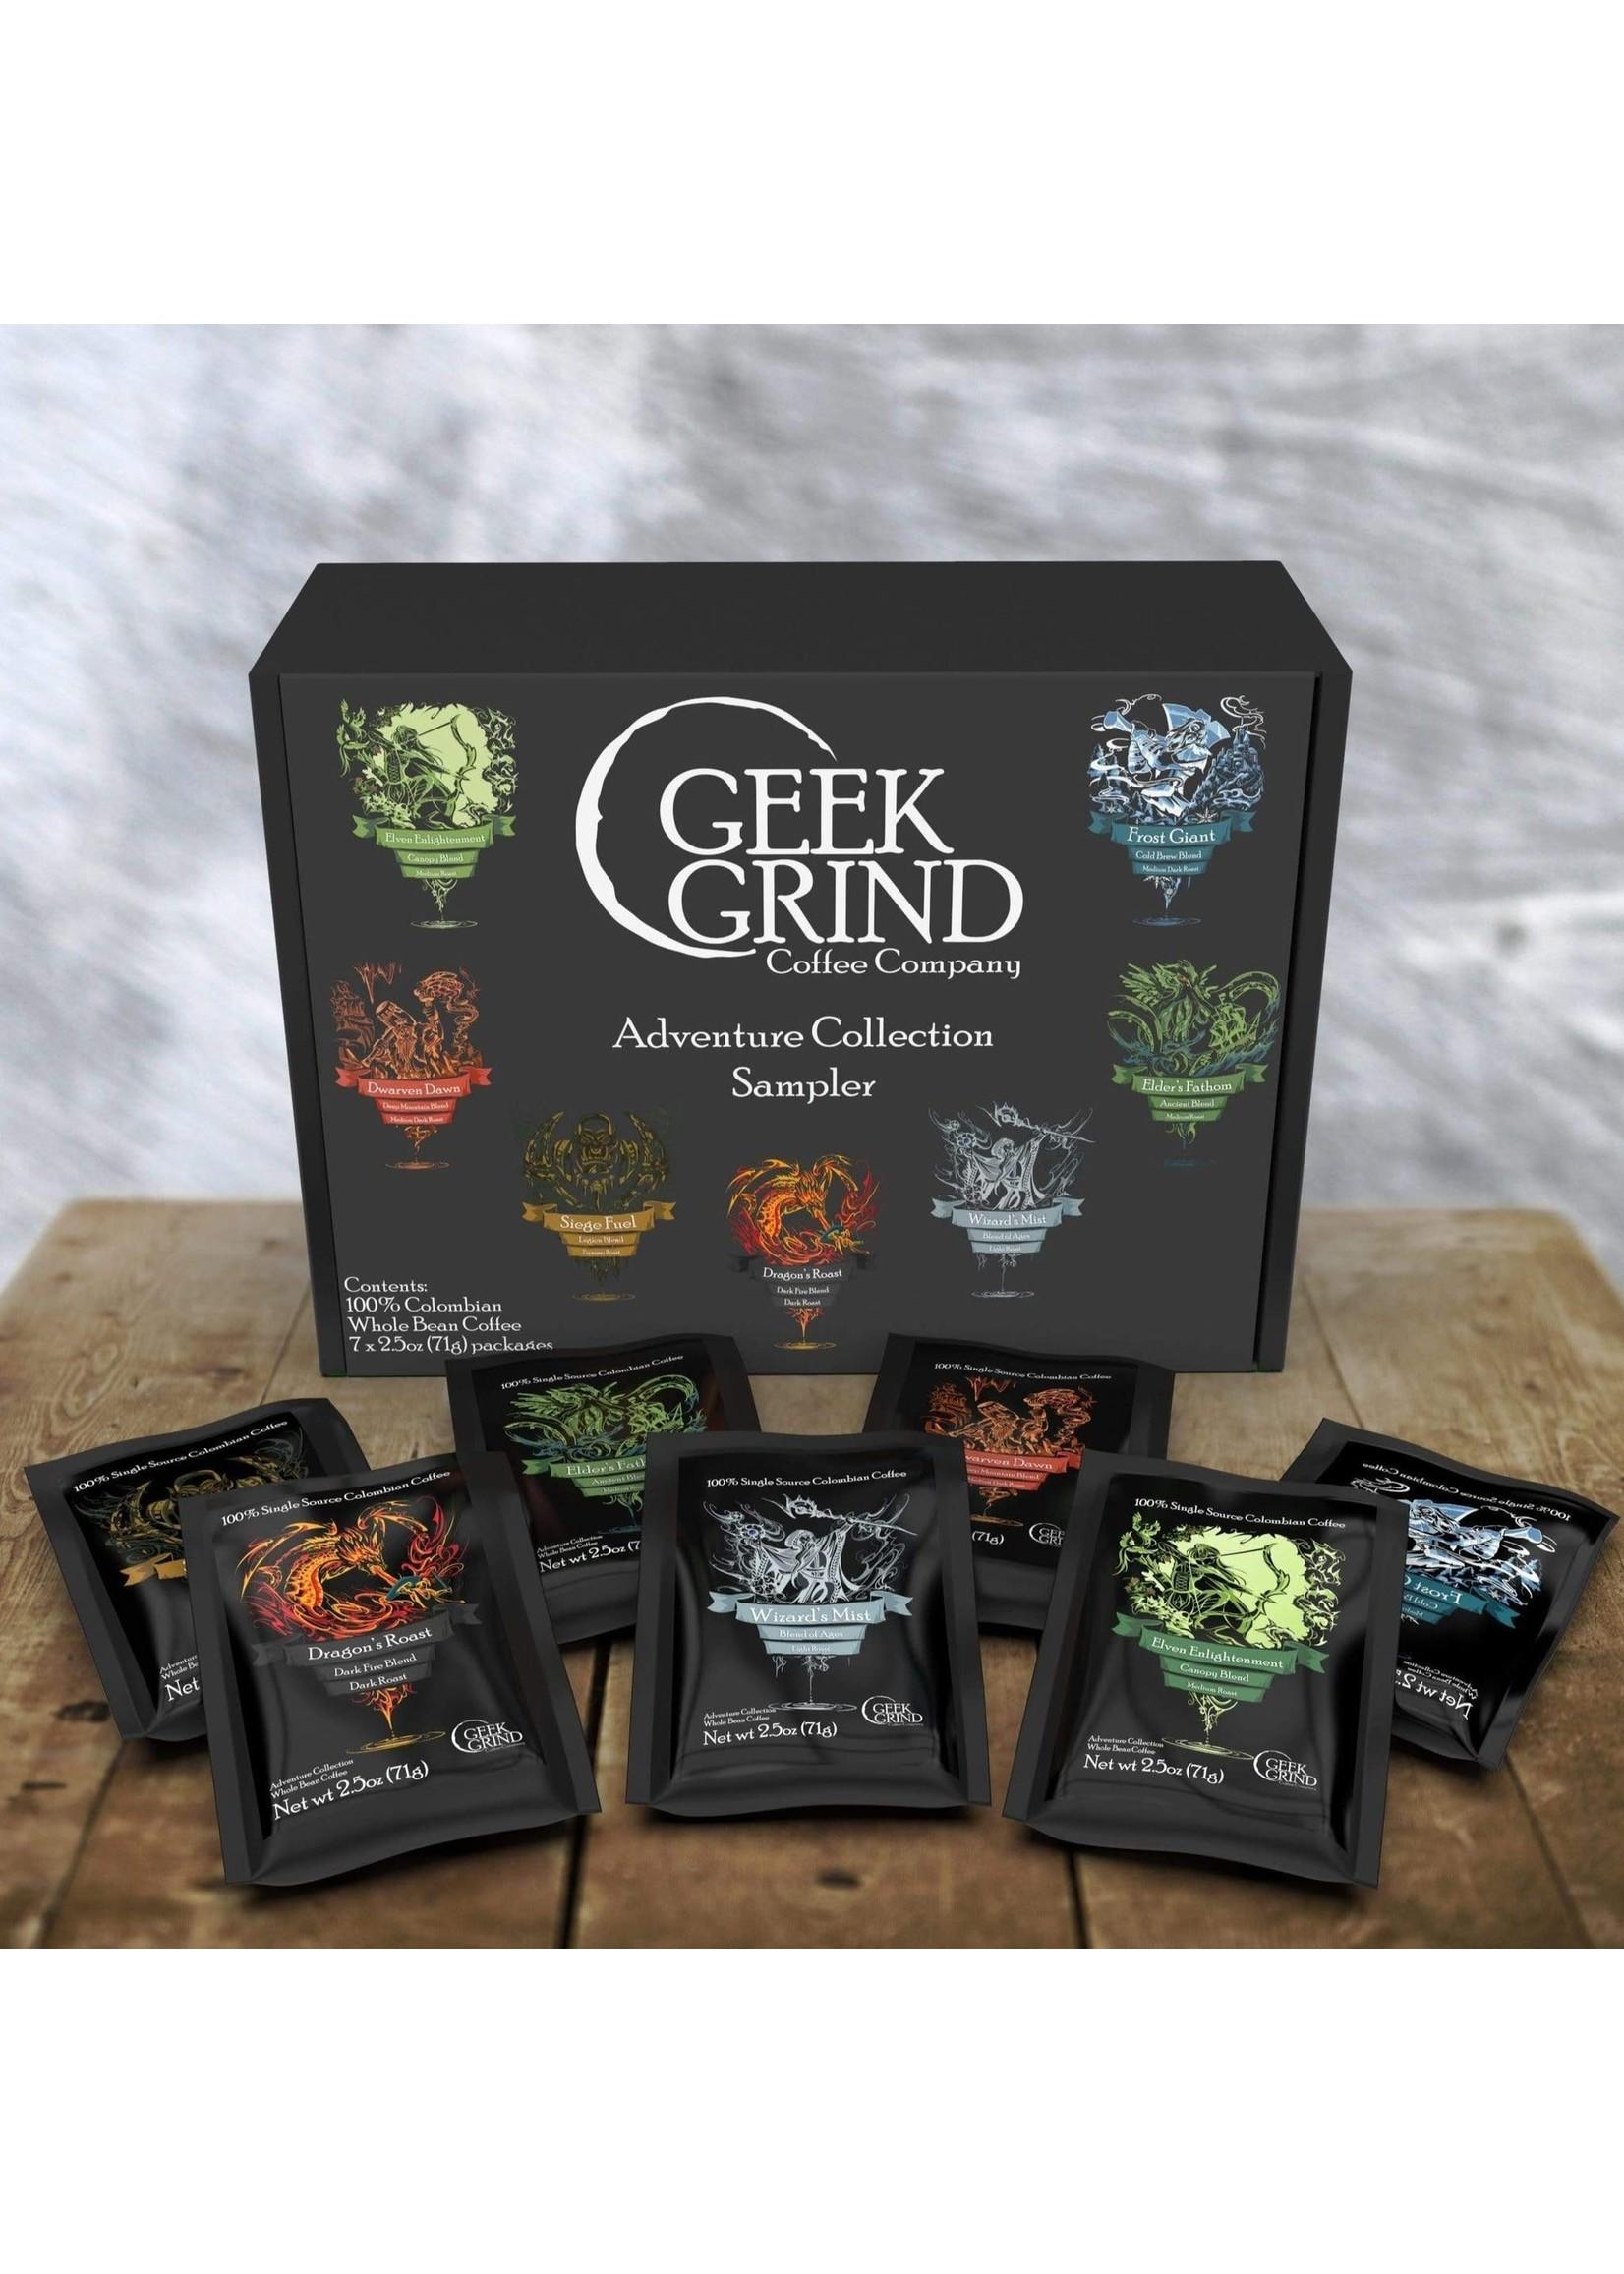 Geek Grind Coffee Sampler Assortment- All 7 Roasts in One Gift/Sampler Box